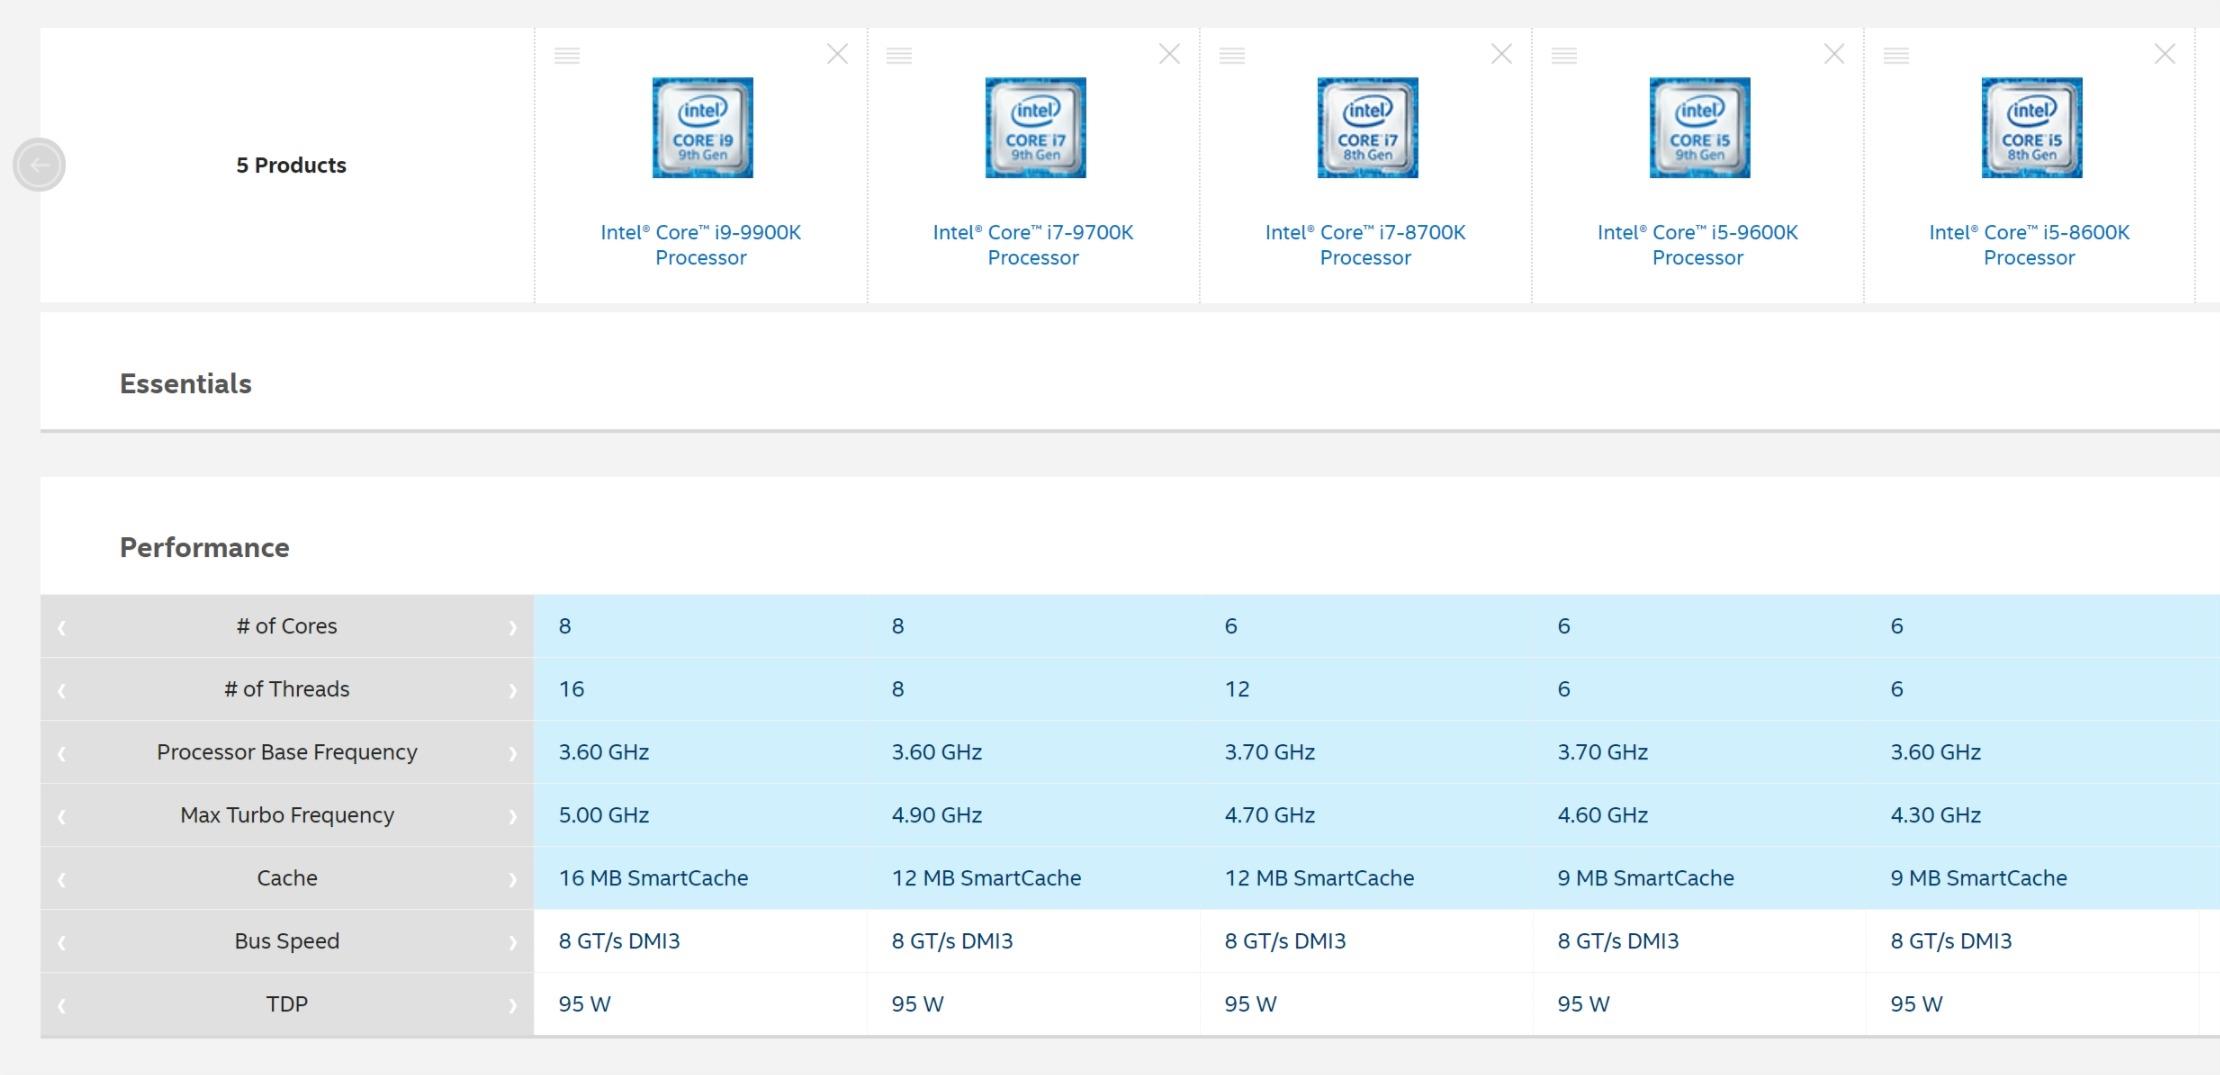 i7-9700K砍掉超线程还贵了1000元 Intel为什么这样做?的照片 - 2